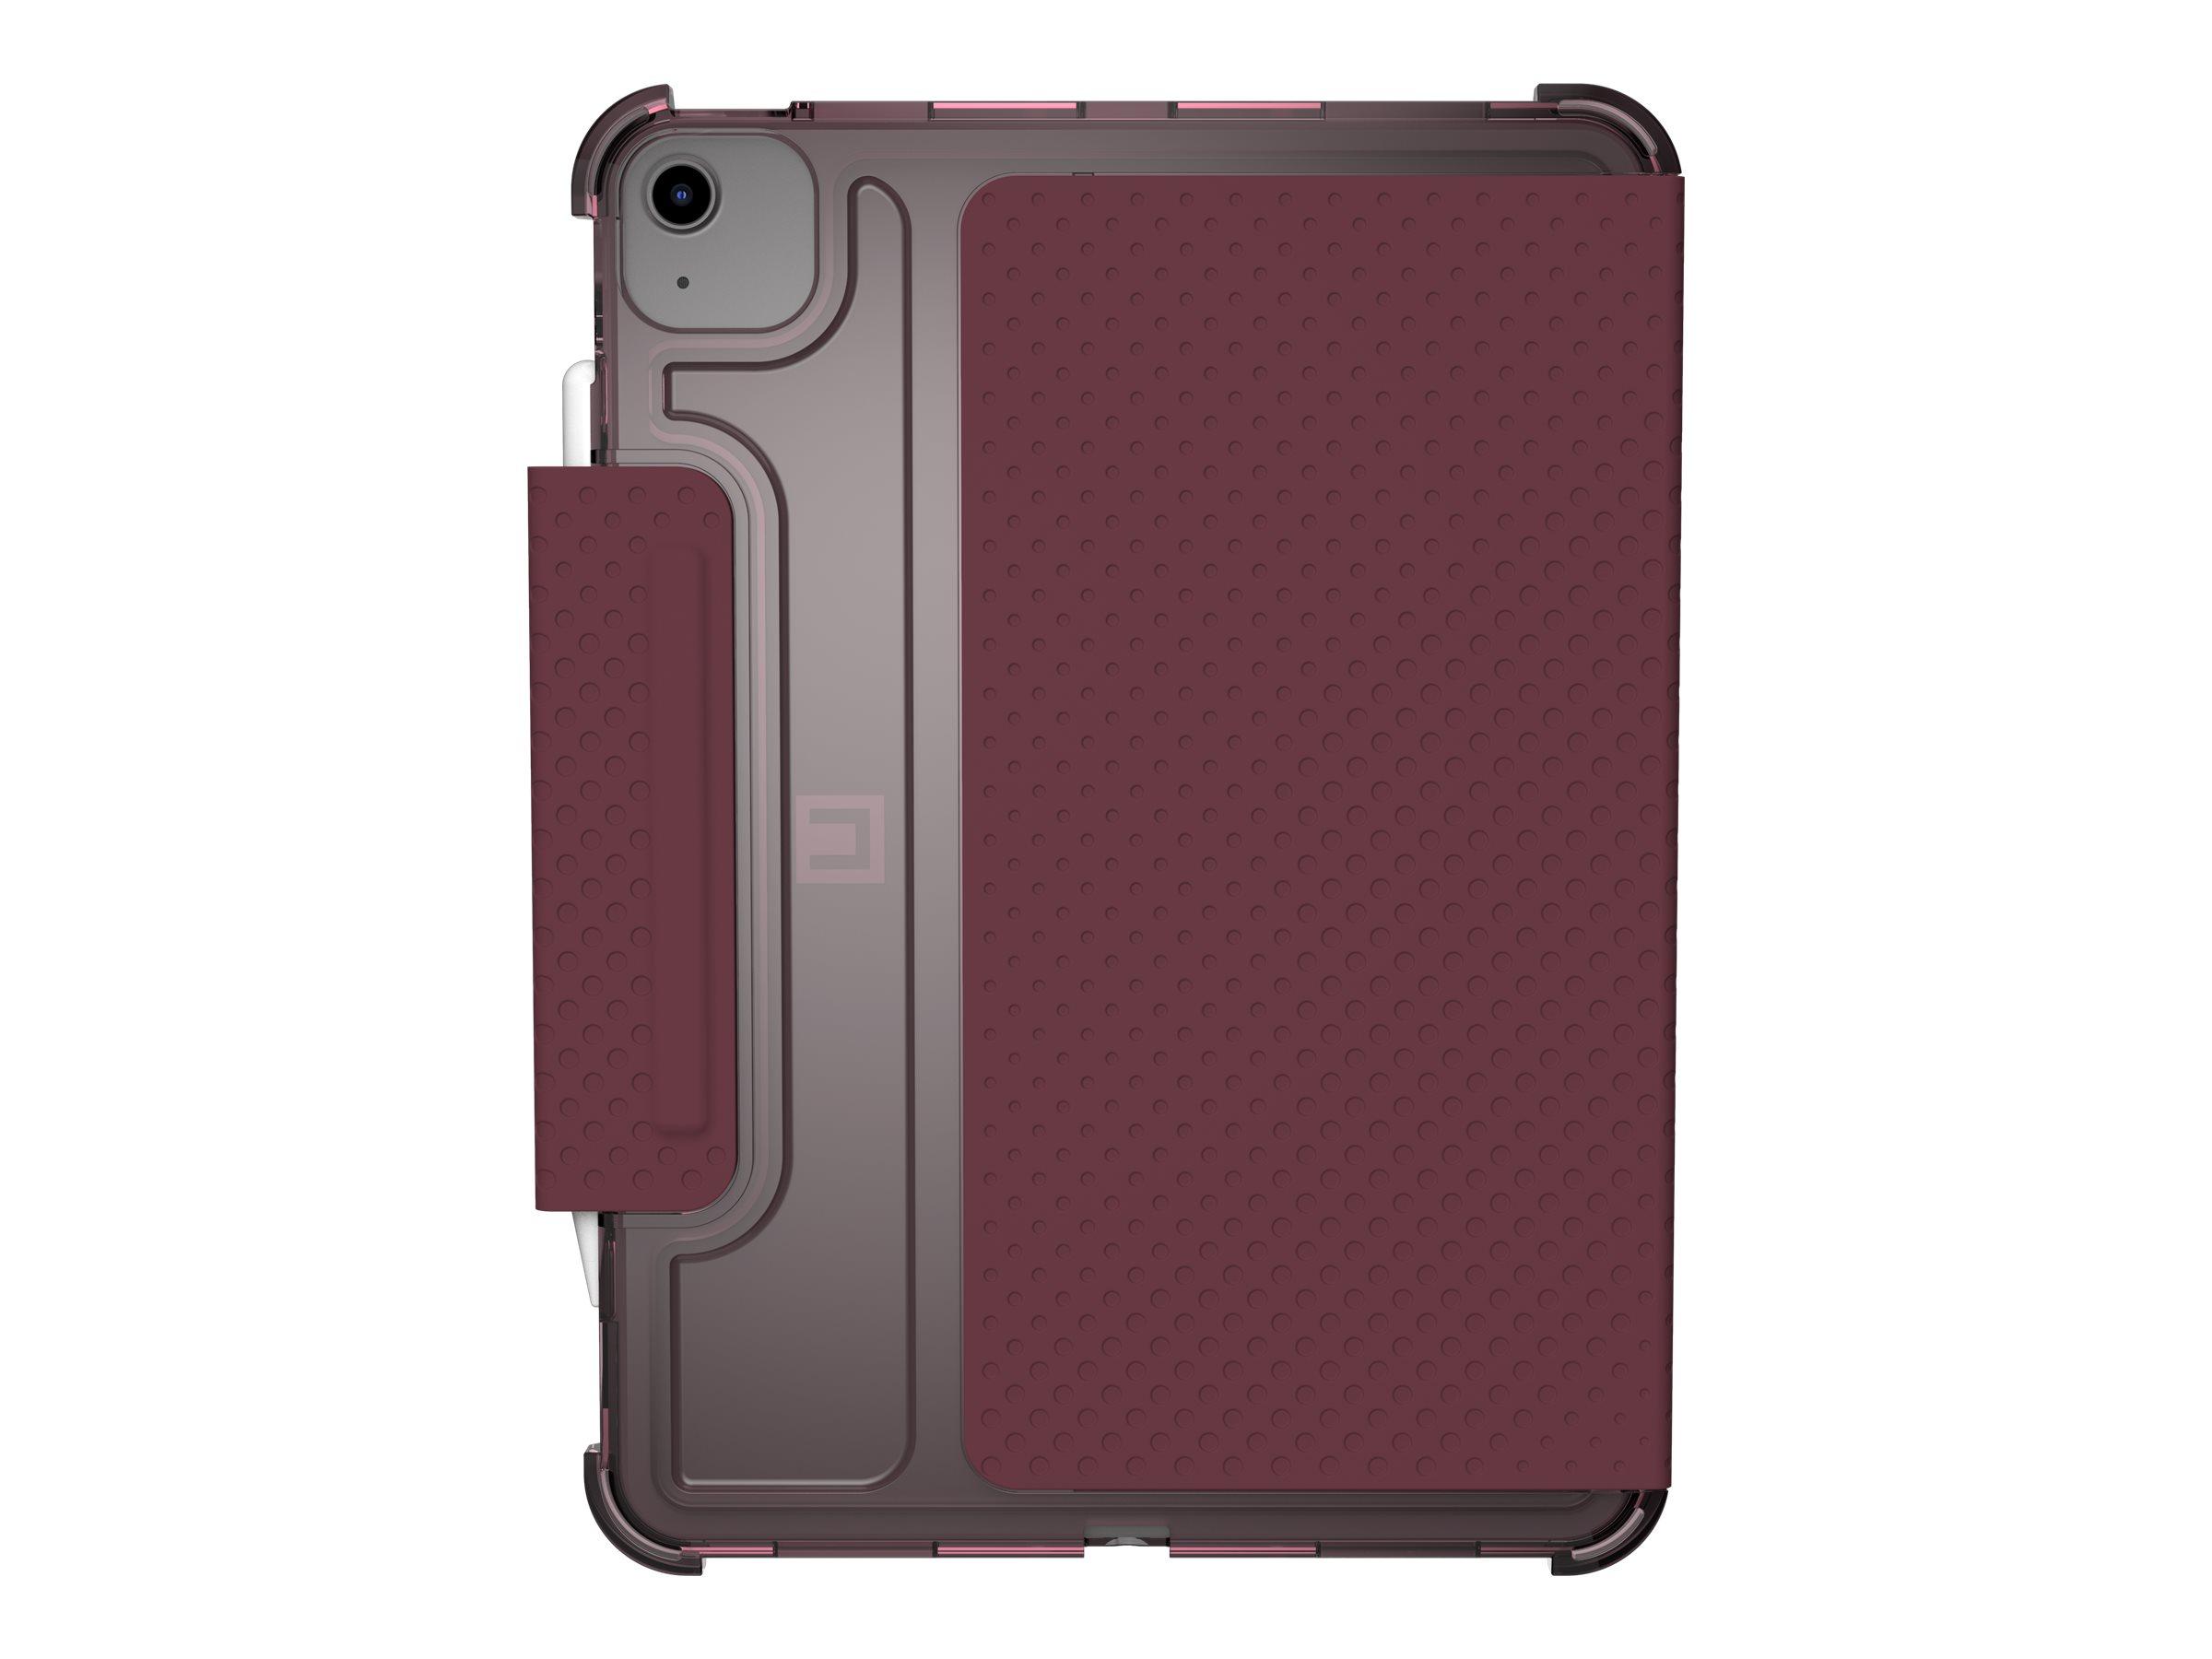 [U] Case for iPad Air 10.9-in (4th Gen, 2020) - Lucent Aubergine/Dusty Rose - Flip-Hülle für Tablet - Aubergine, Dusty Rose - 10